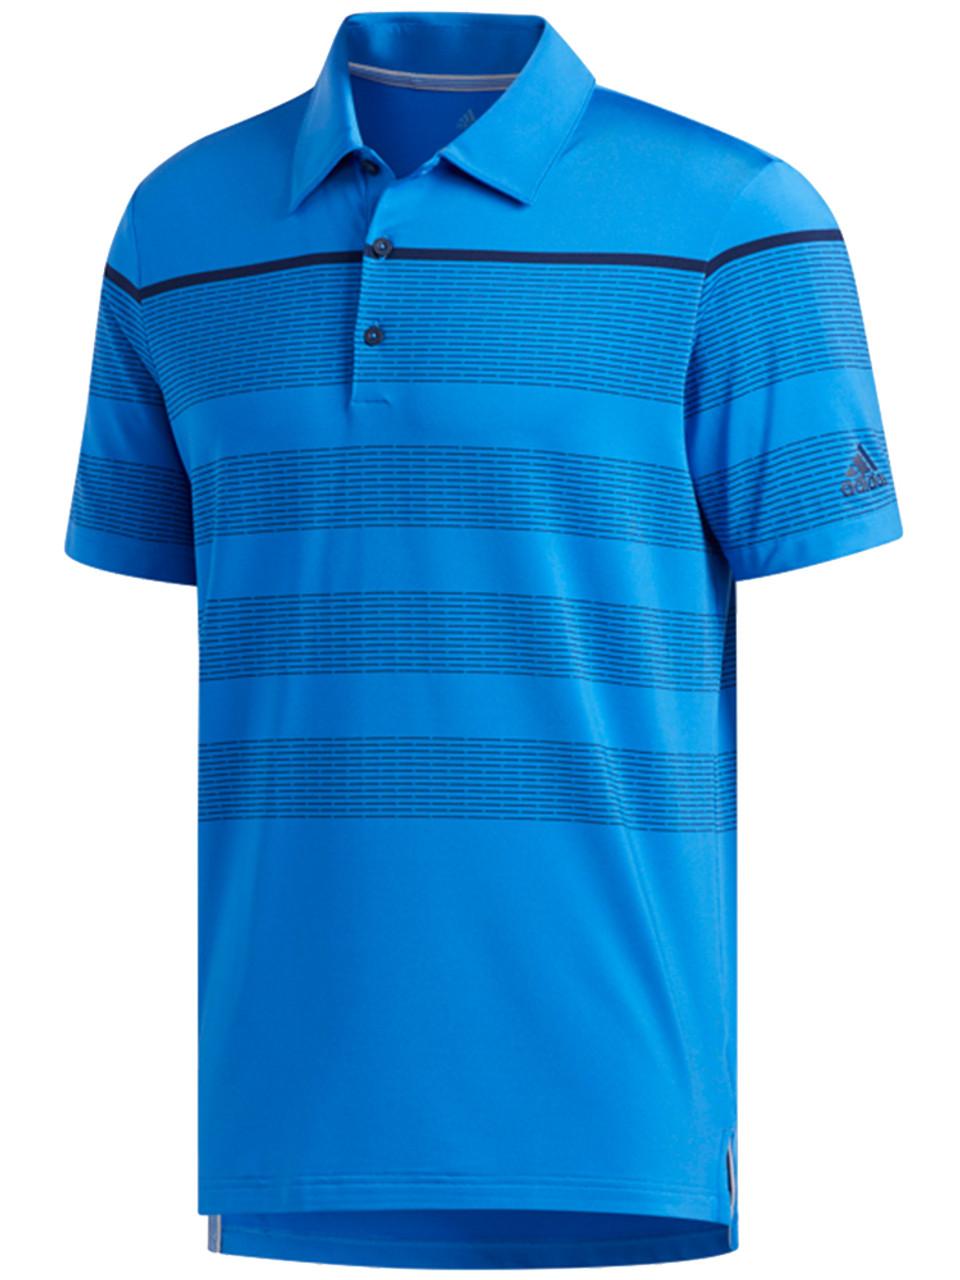 662b3aa6 Adidas Ultimate365 Dash Stripe Polo - True Blue/Navy - Mens For Sale    GolfBox